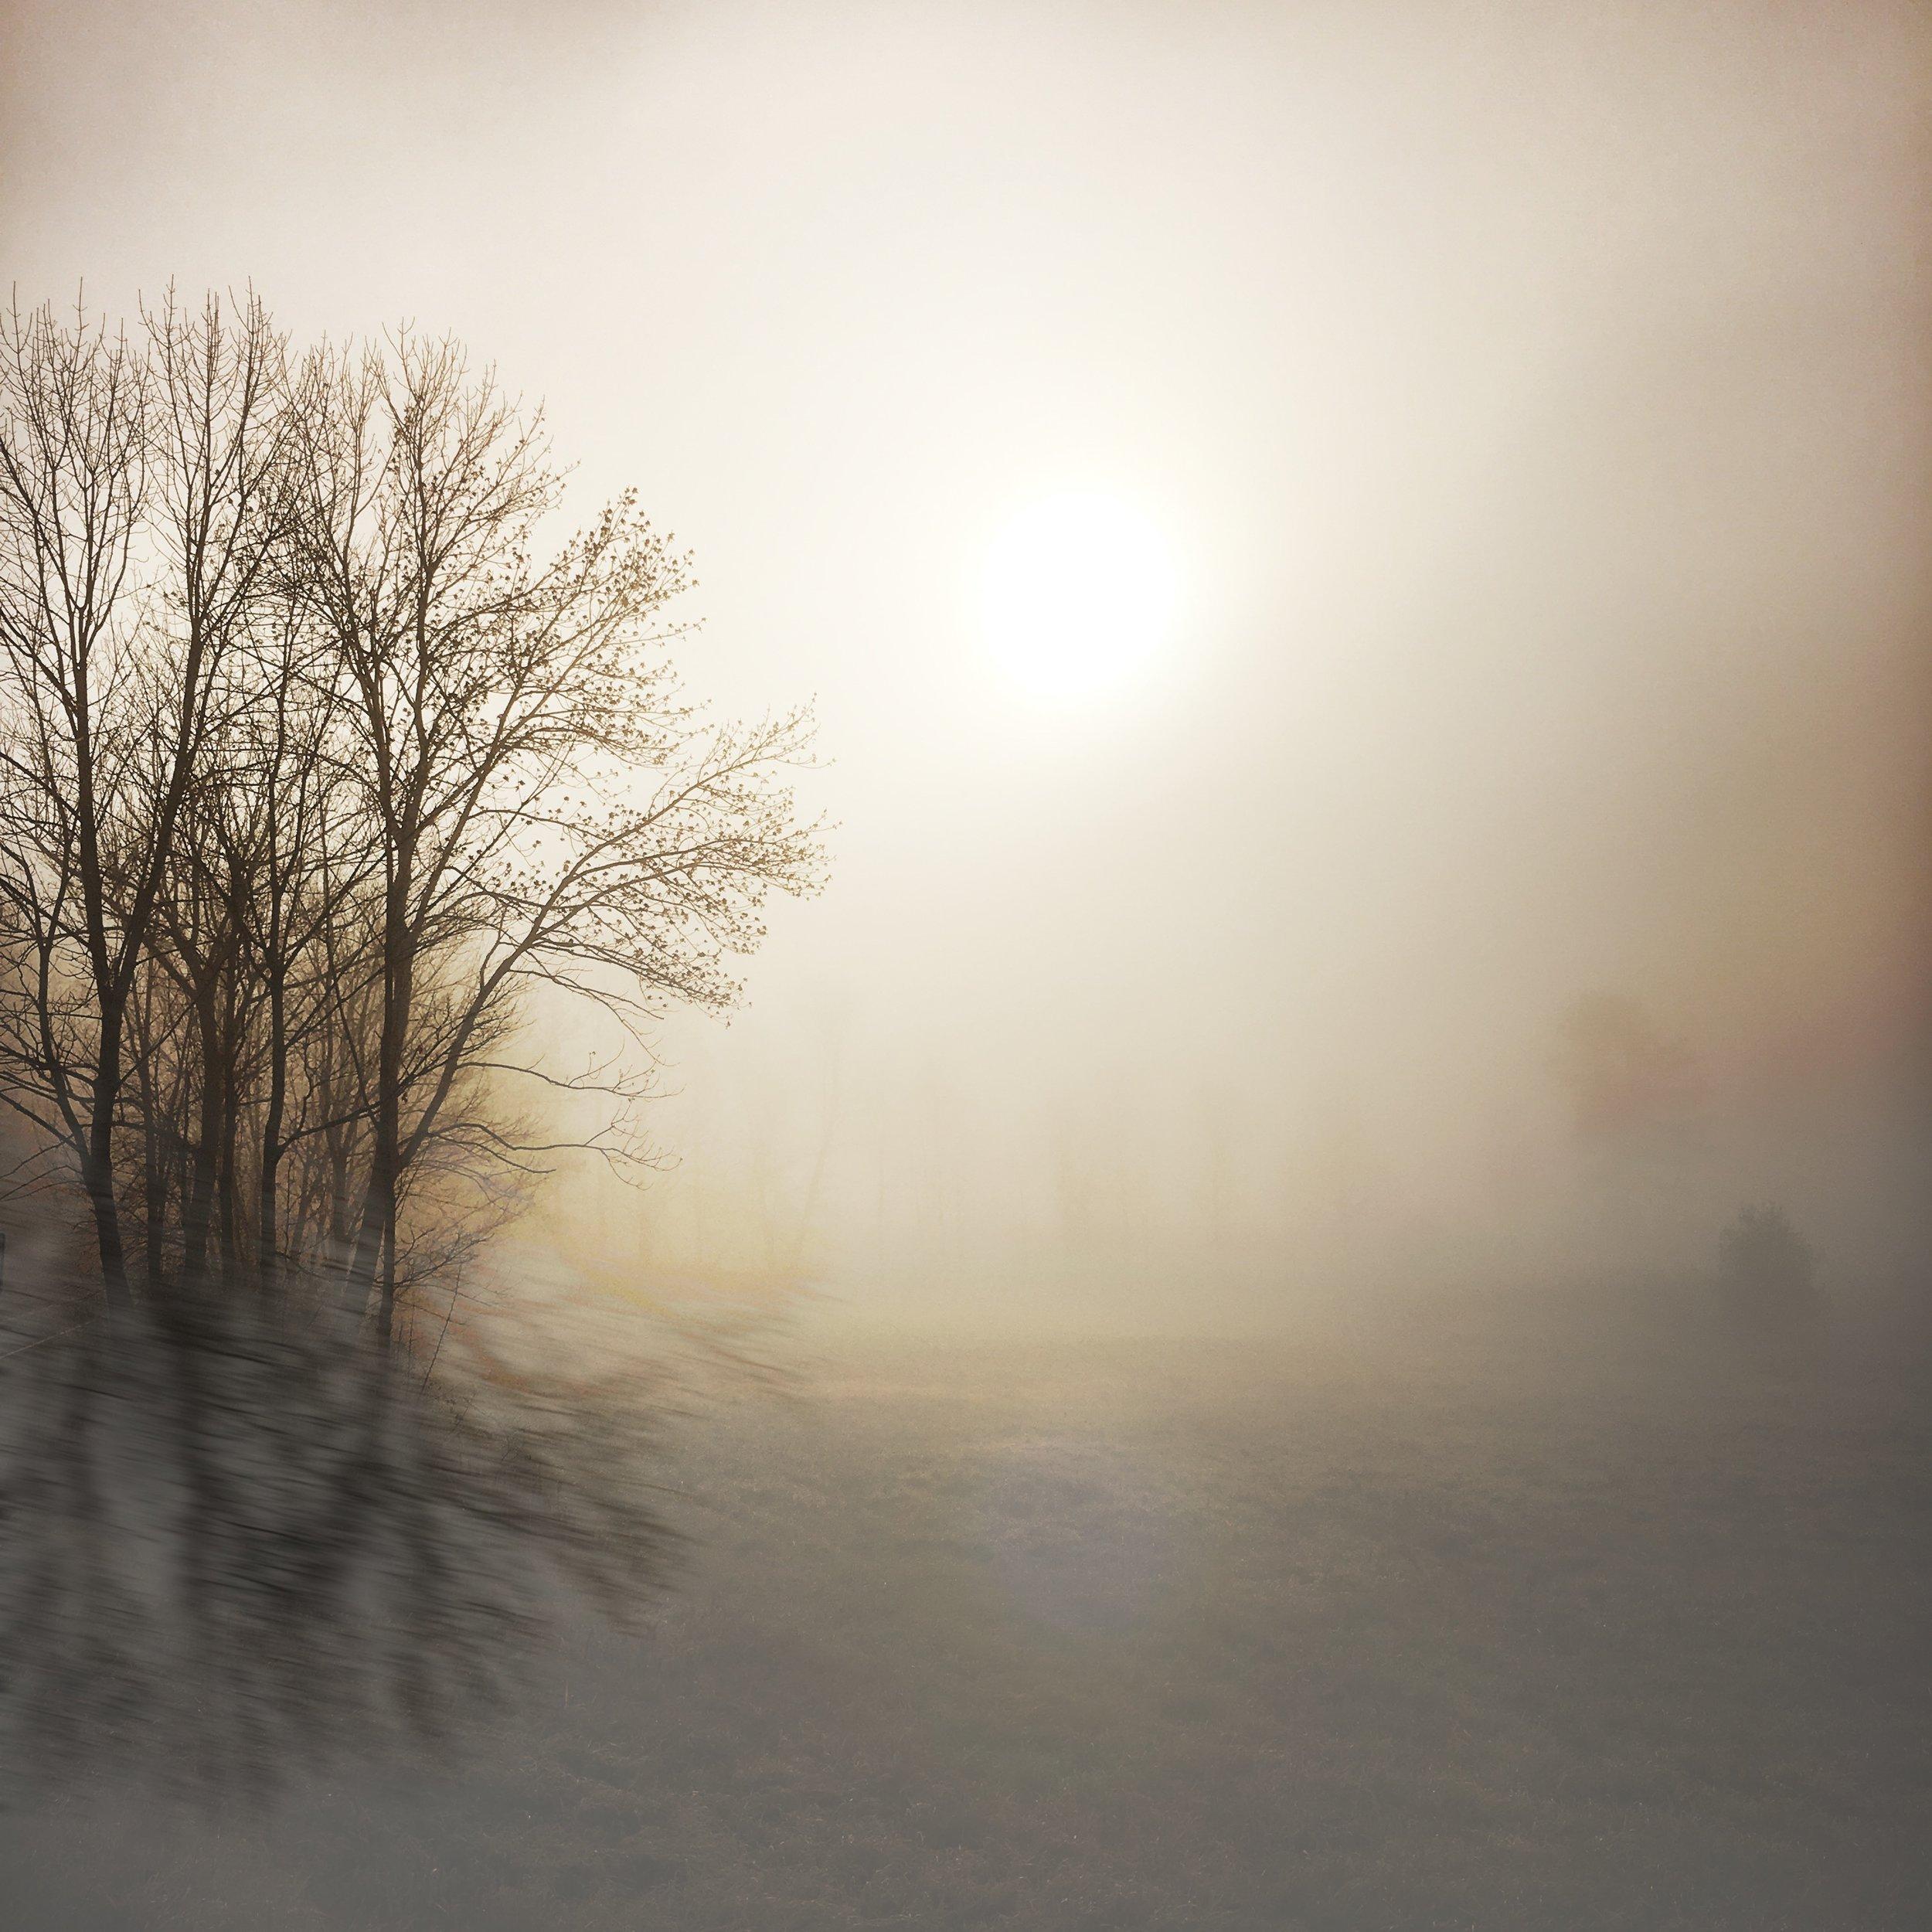 ©Morning Mist by Dena  T Bray